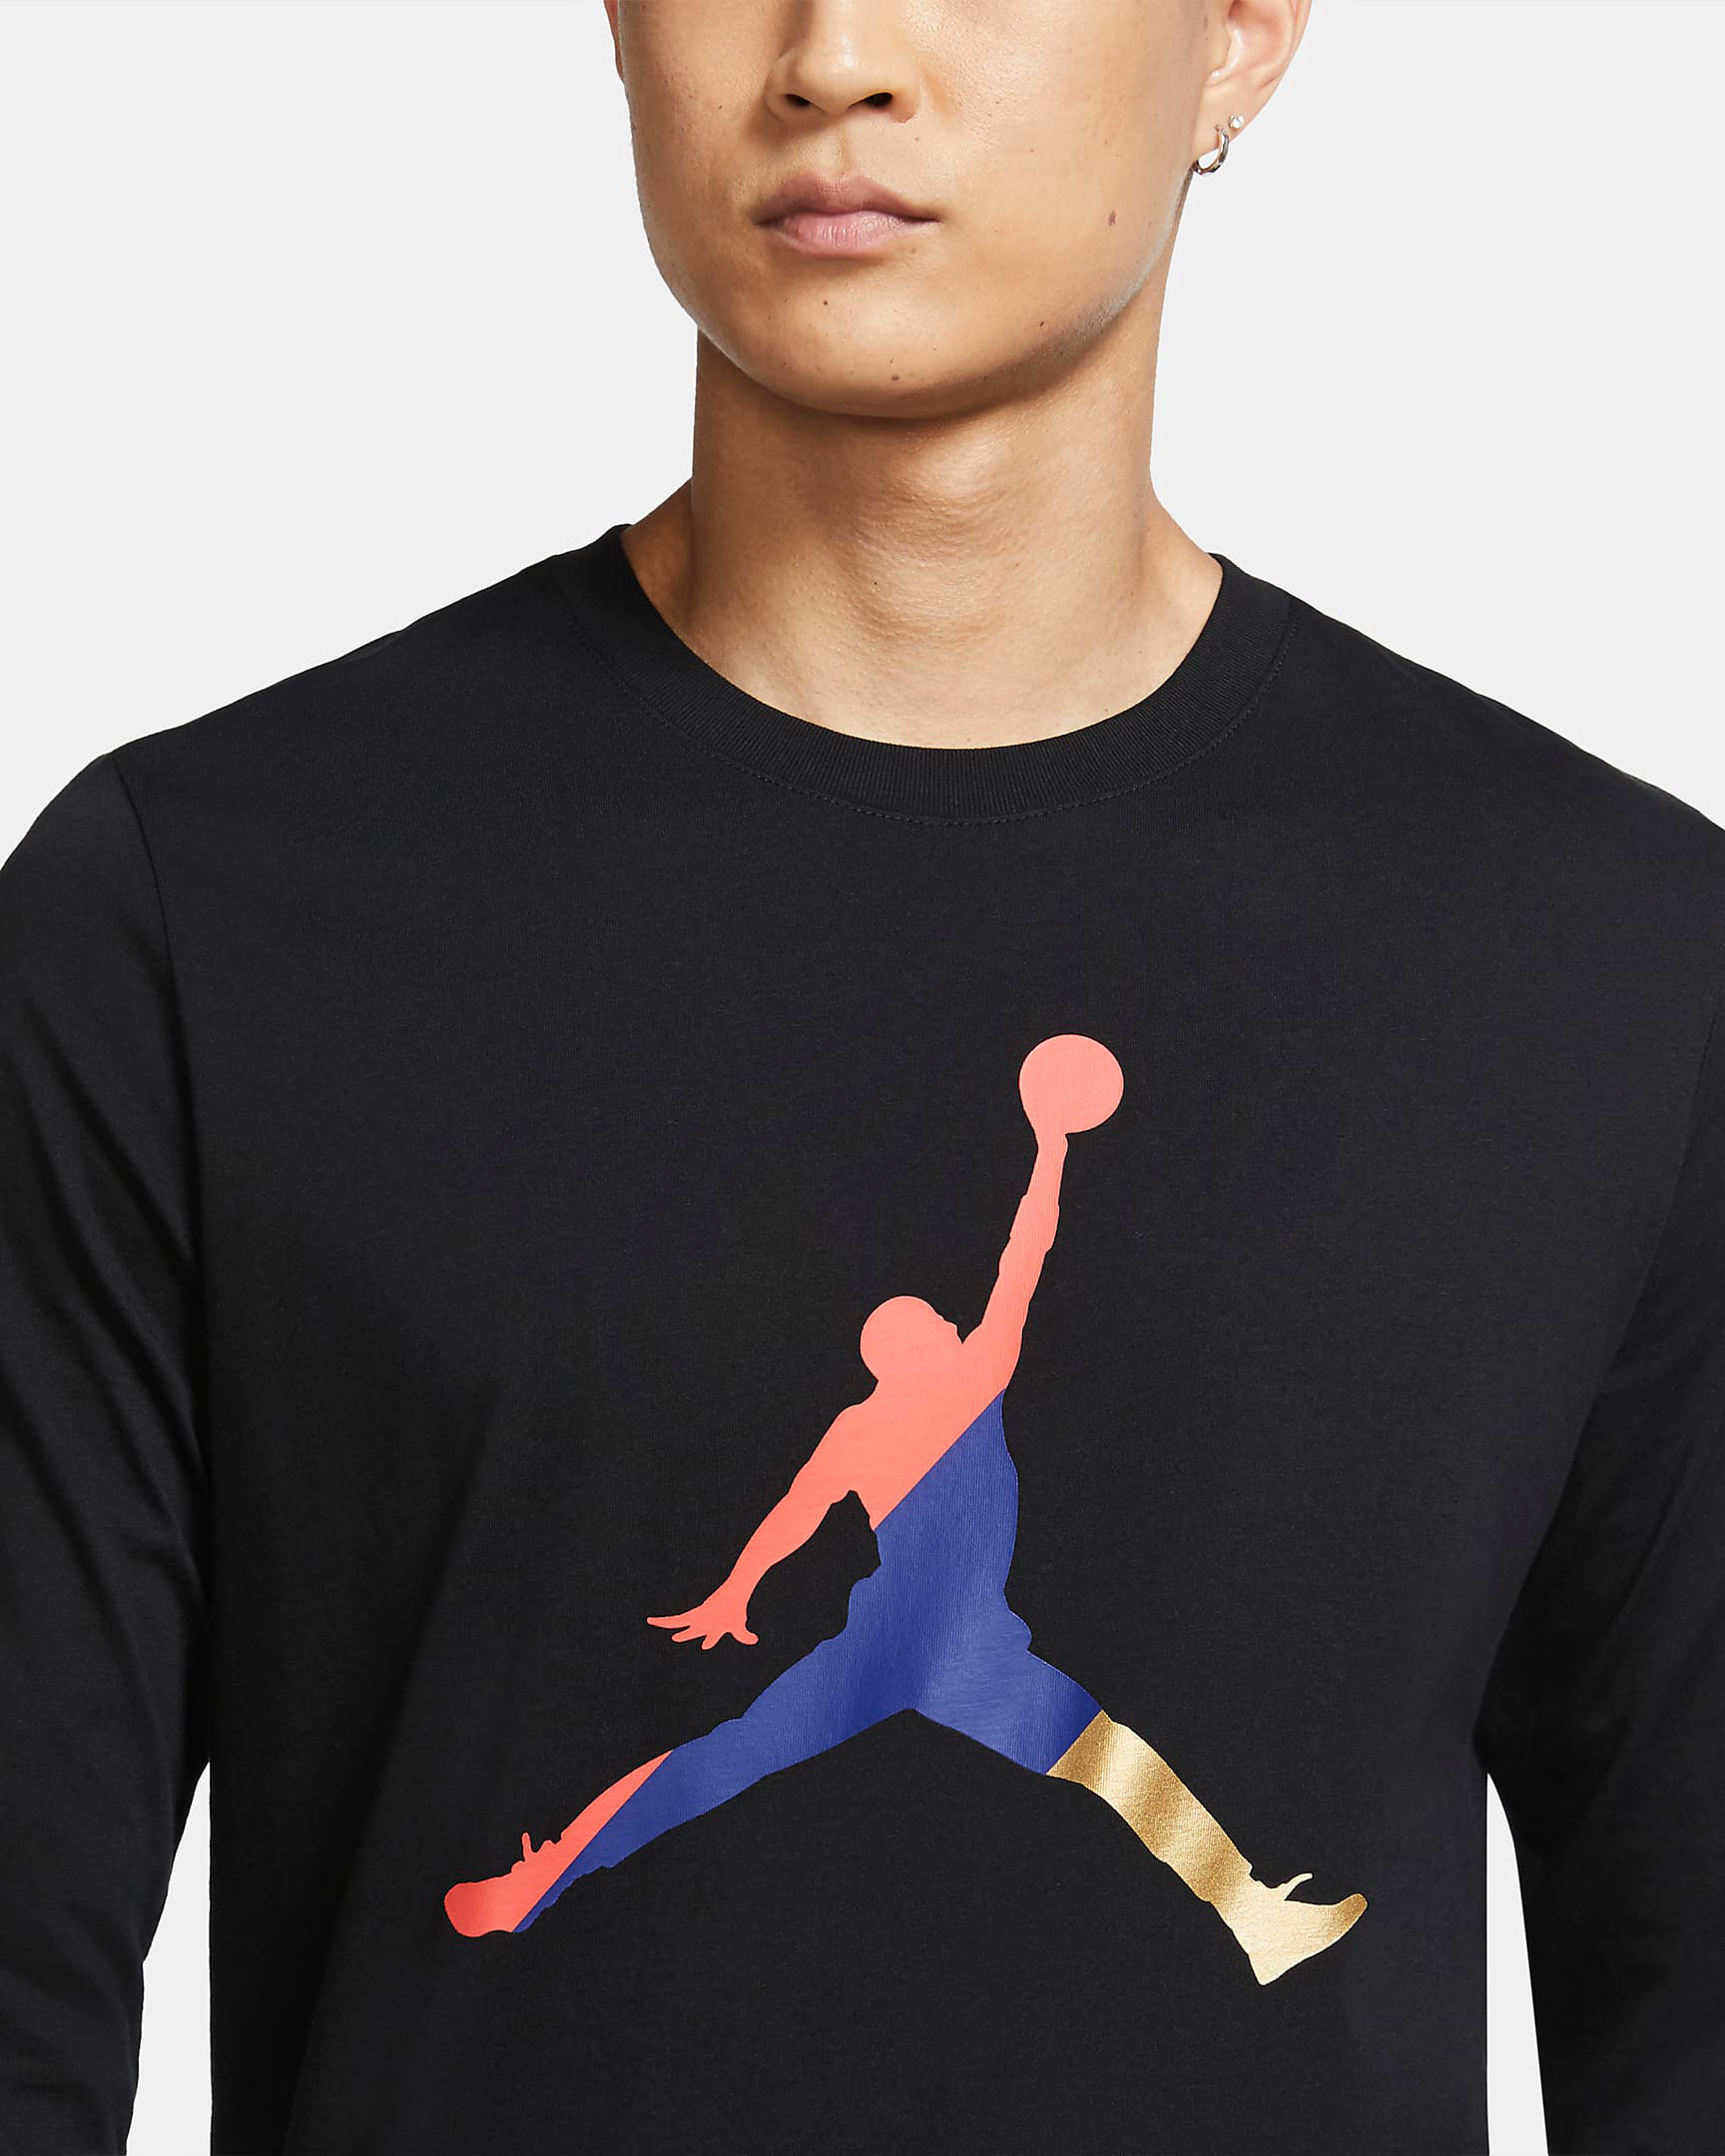 air-jordan-7-greater-china-long-sleeve-shirt-match-1